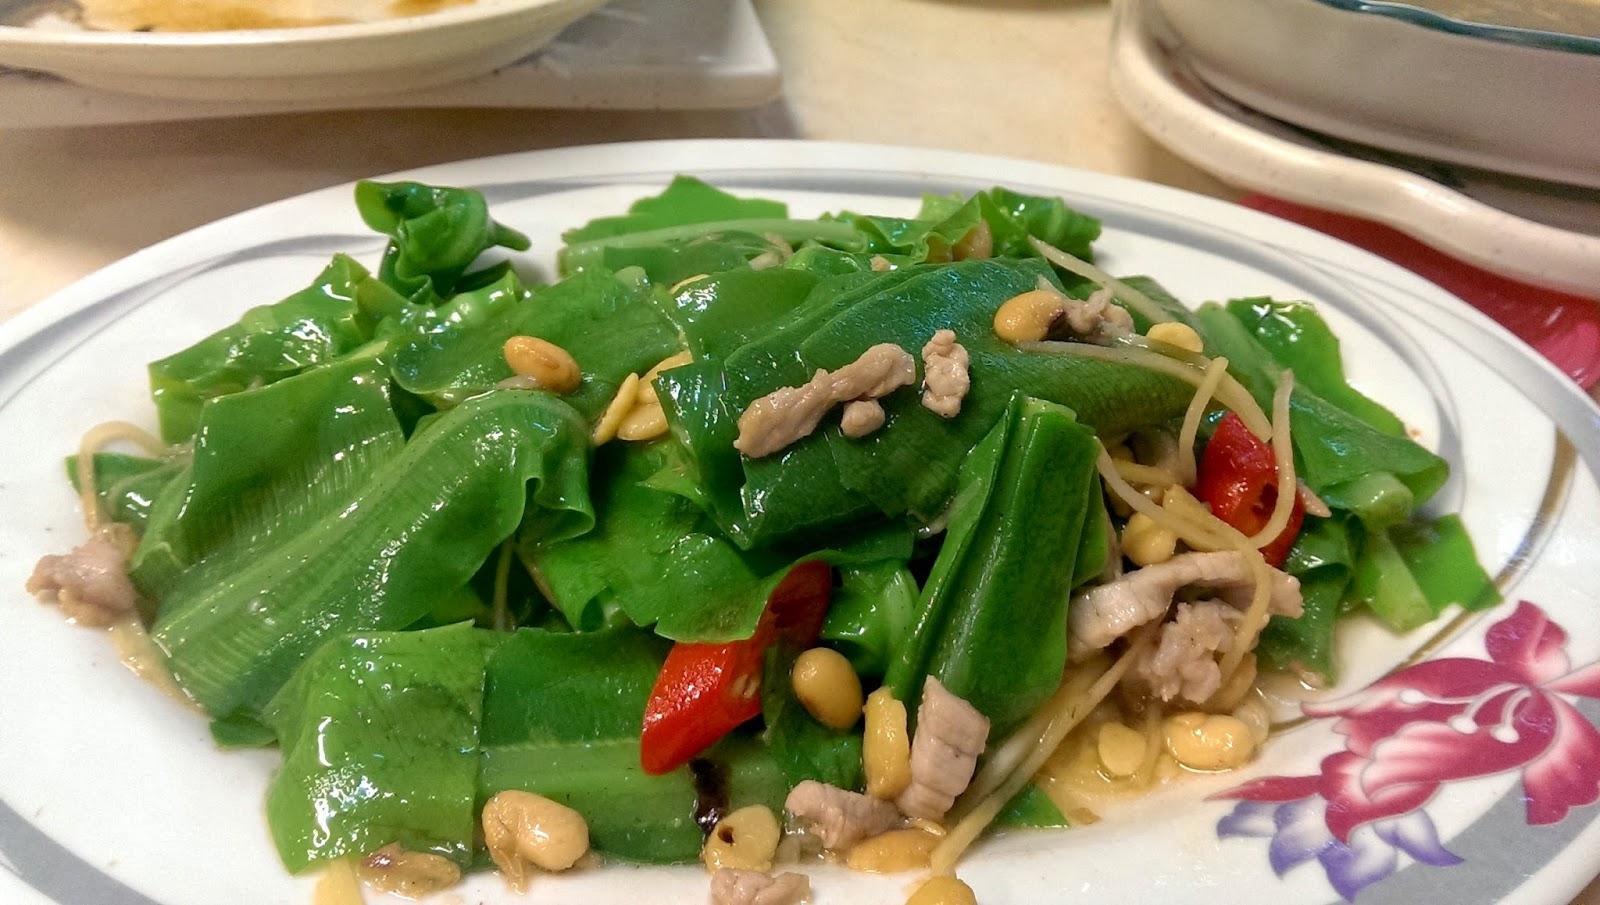 2015 02 02%2B12.36.51 - [食記] 葉家生魚片 - 布袋觀光漁市中的鮮魚餐廳